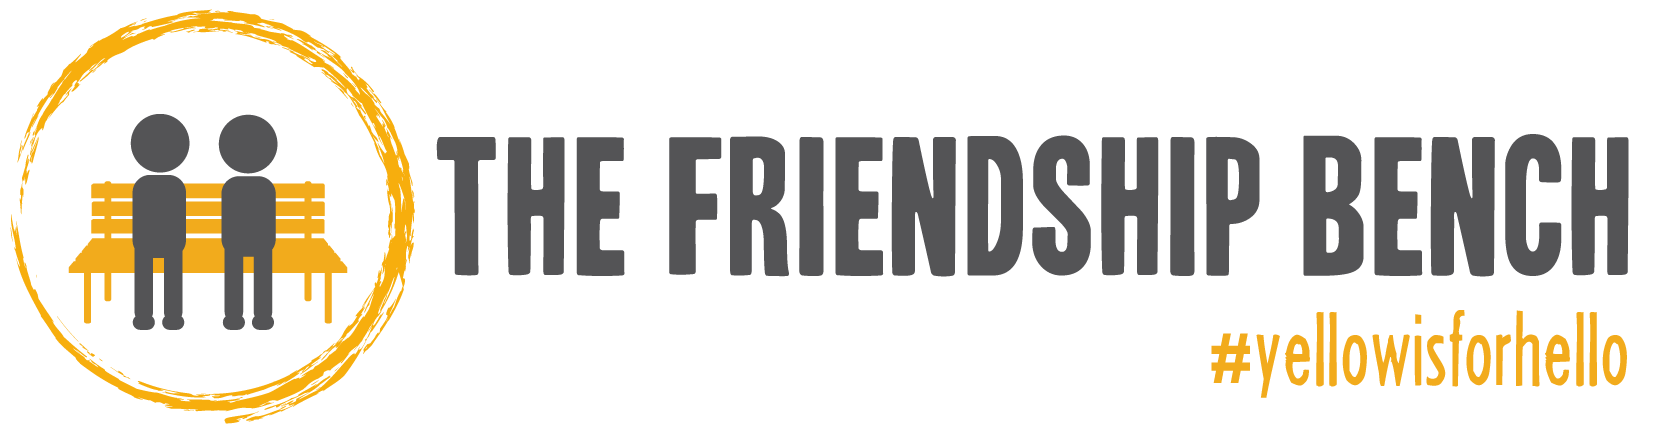 friendshipbench_logo2-1.png